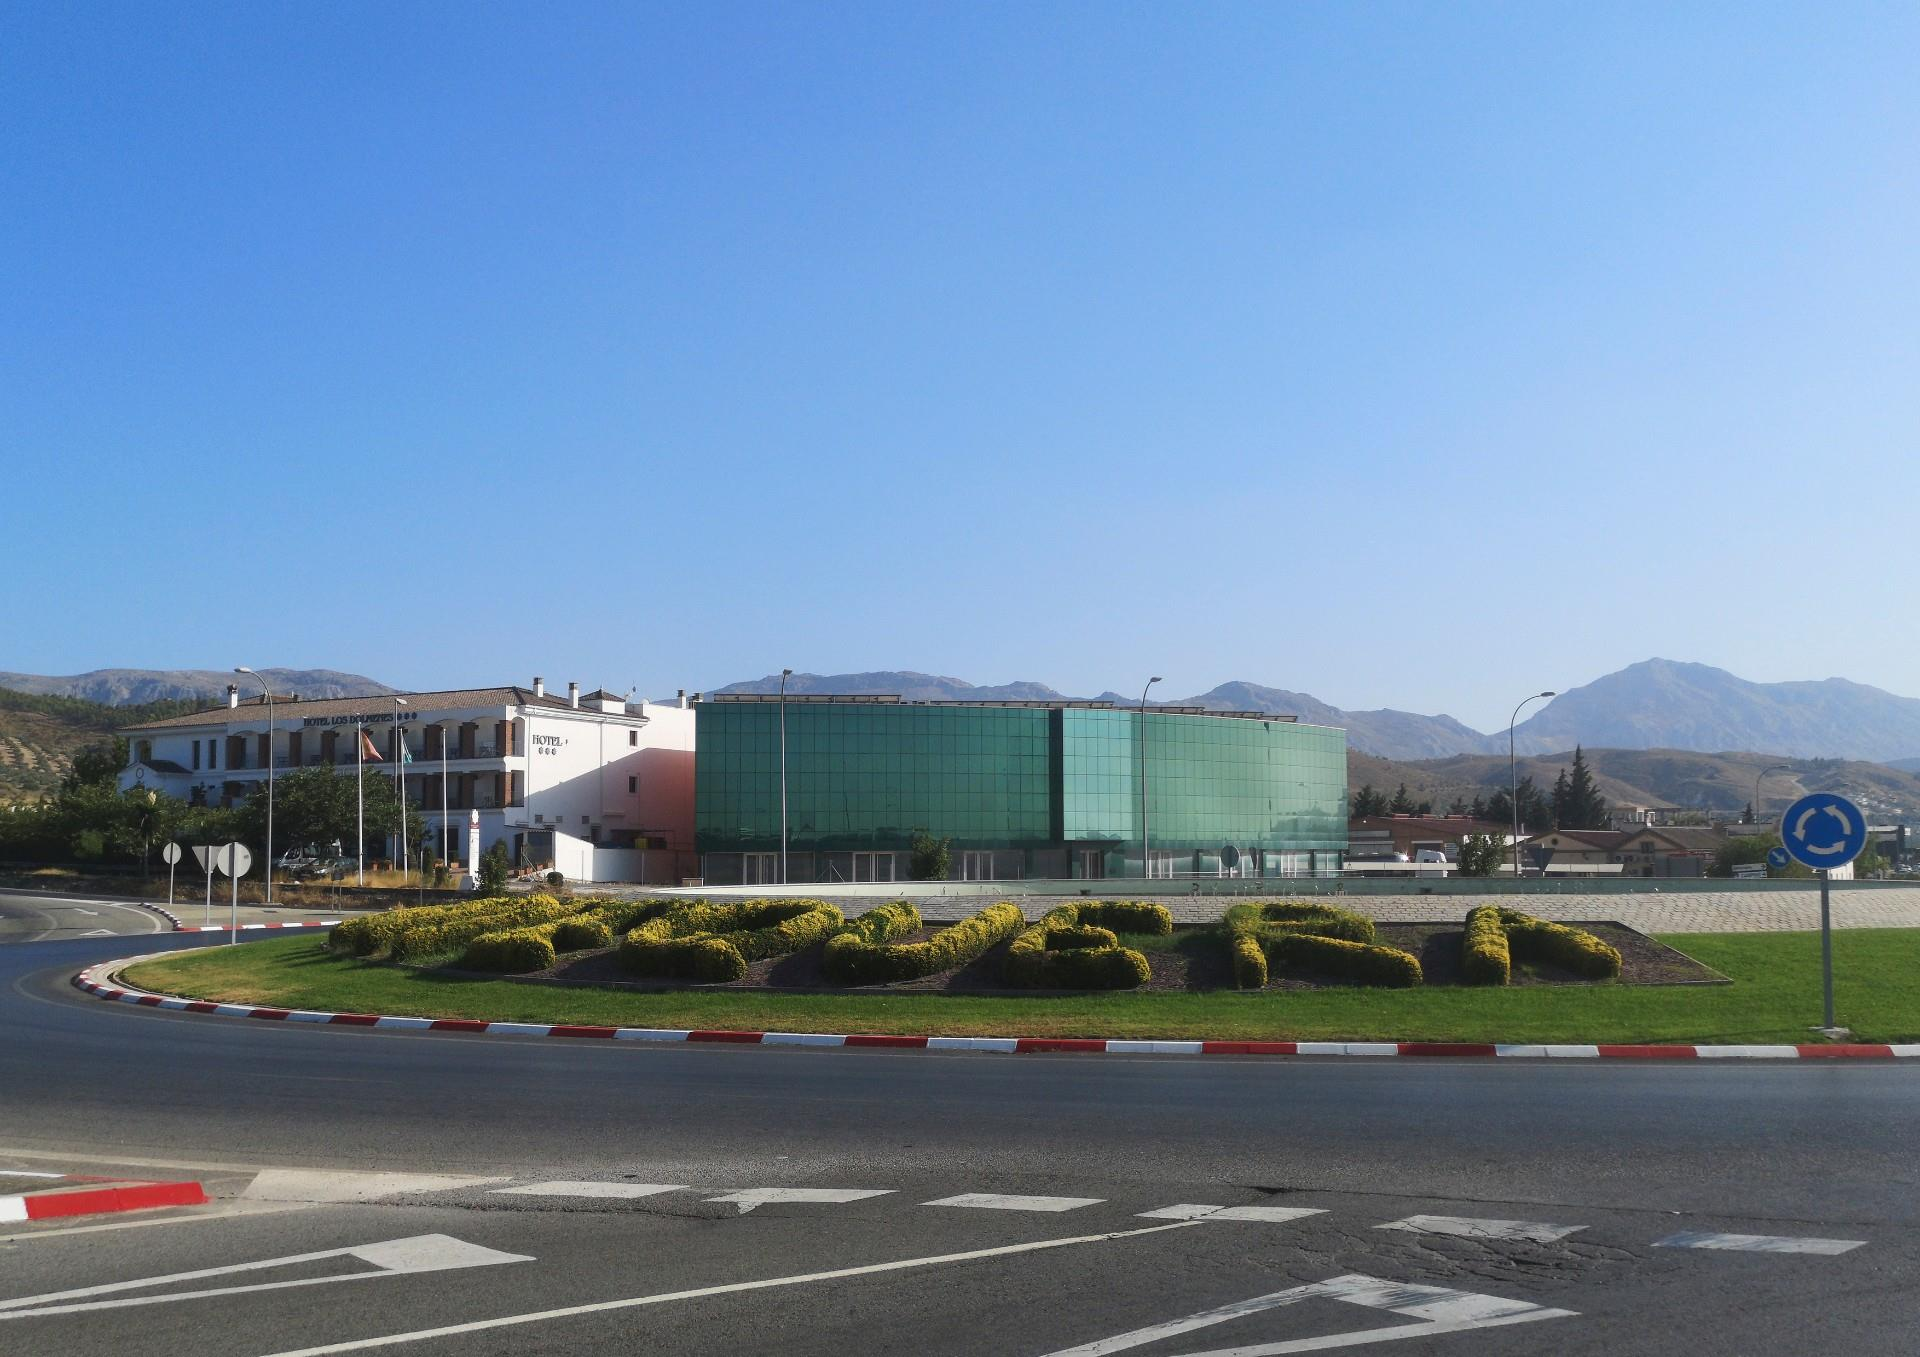 Oficina de alquiler en Zona de Cueva de Menga (Antequera, Málaga)